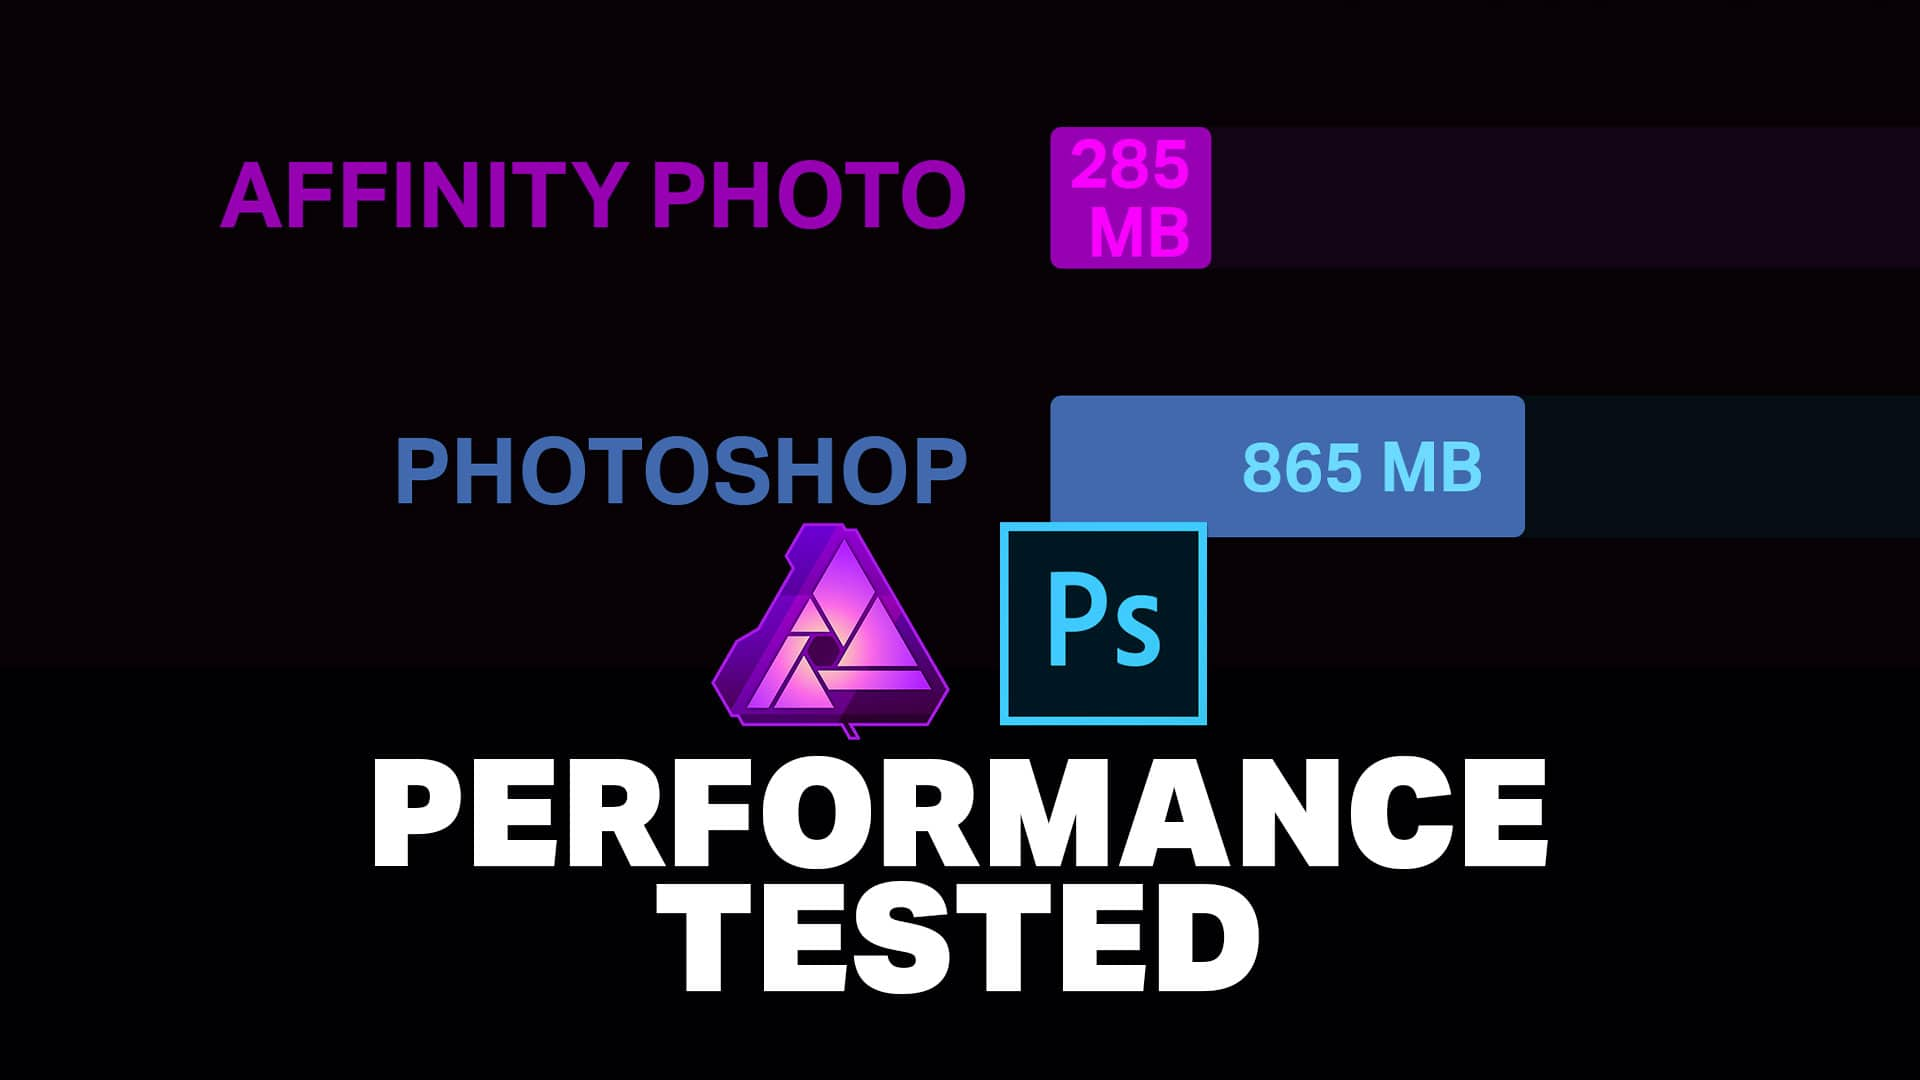 Affinity Photo vs Photoshop Benchmark - Denny's Tips